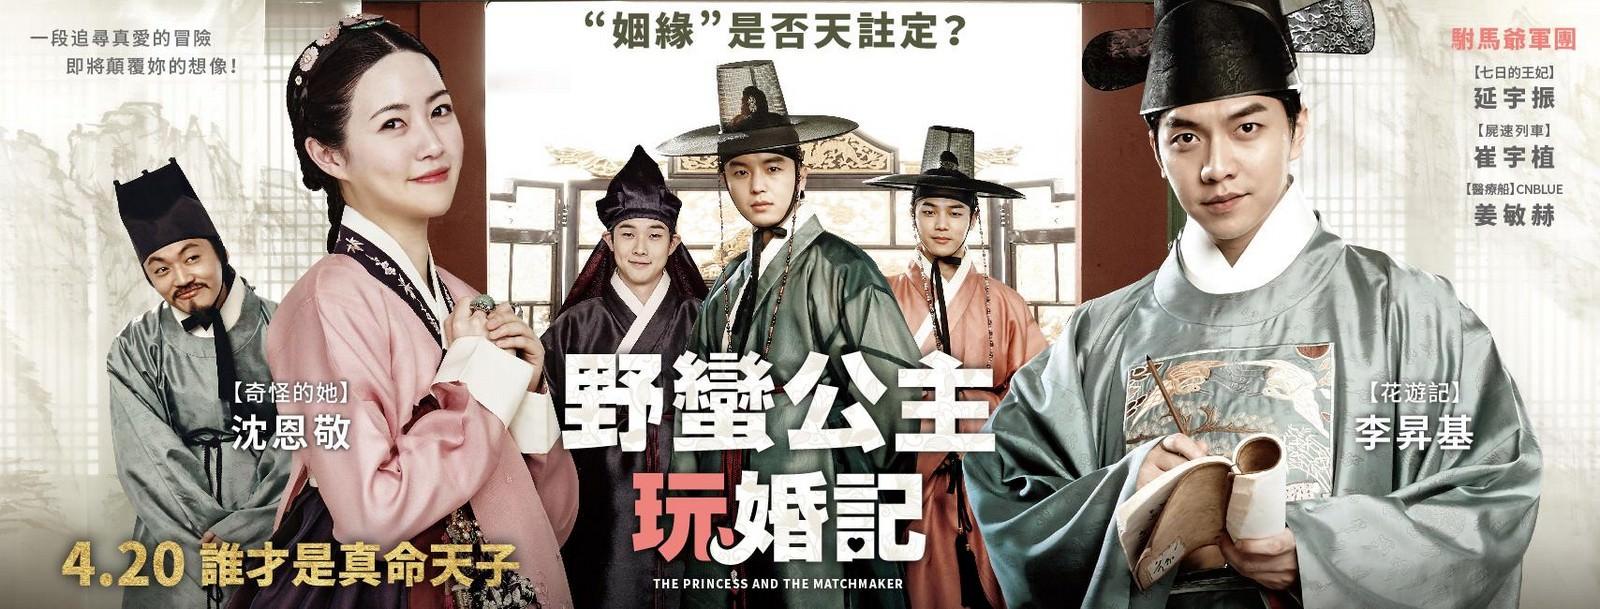 Movie, 궁합(韓國) / 野蠻公主玩婚記(台) / Marital Harmony(英文) / 宫合(網), 電影海報, 台灣, 橫板